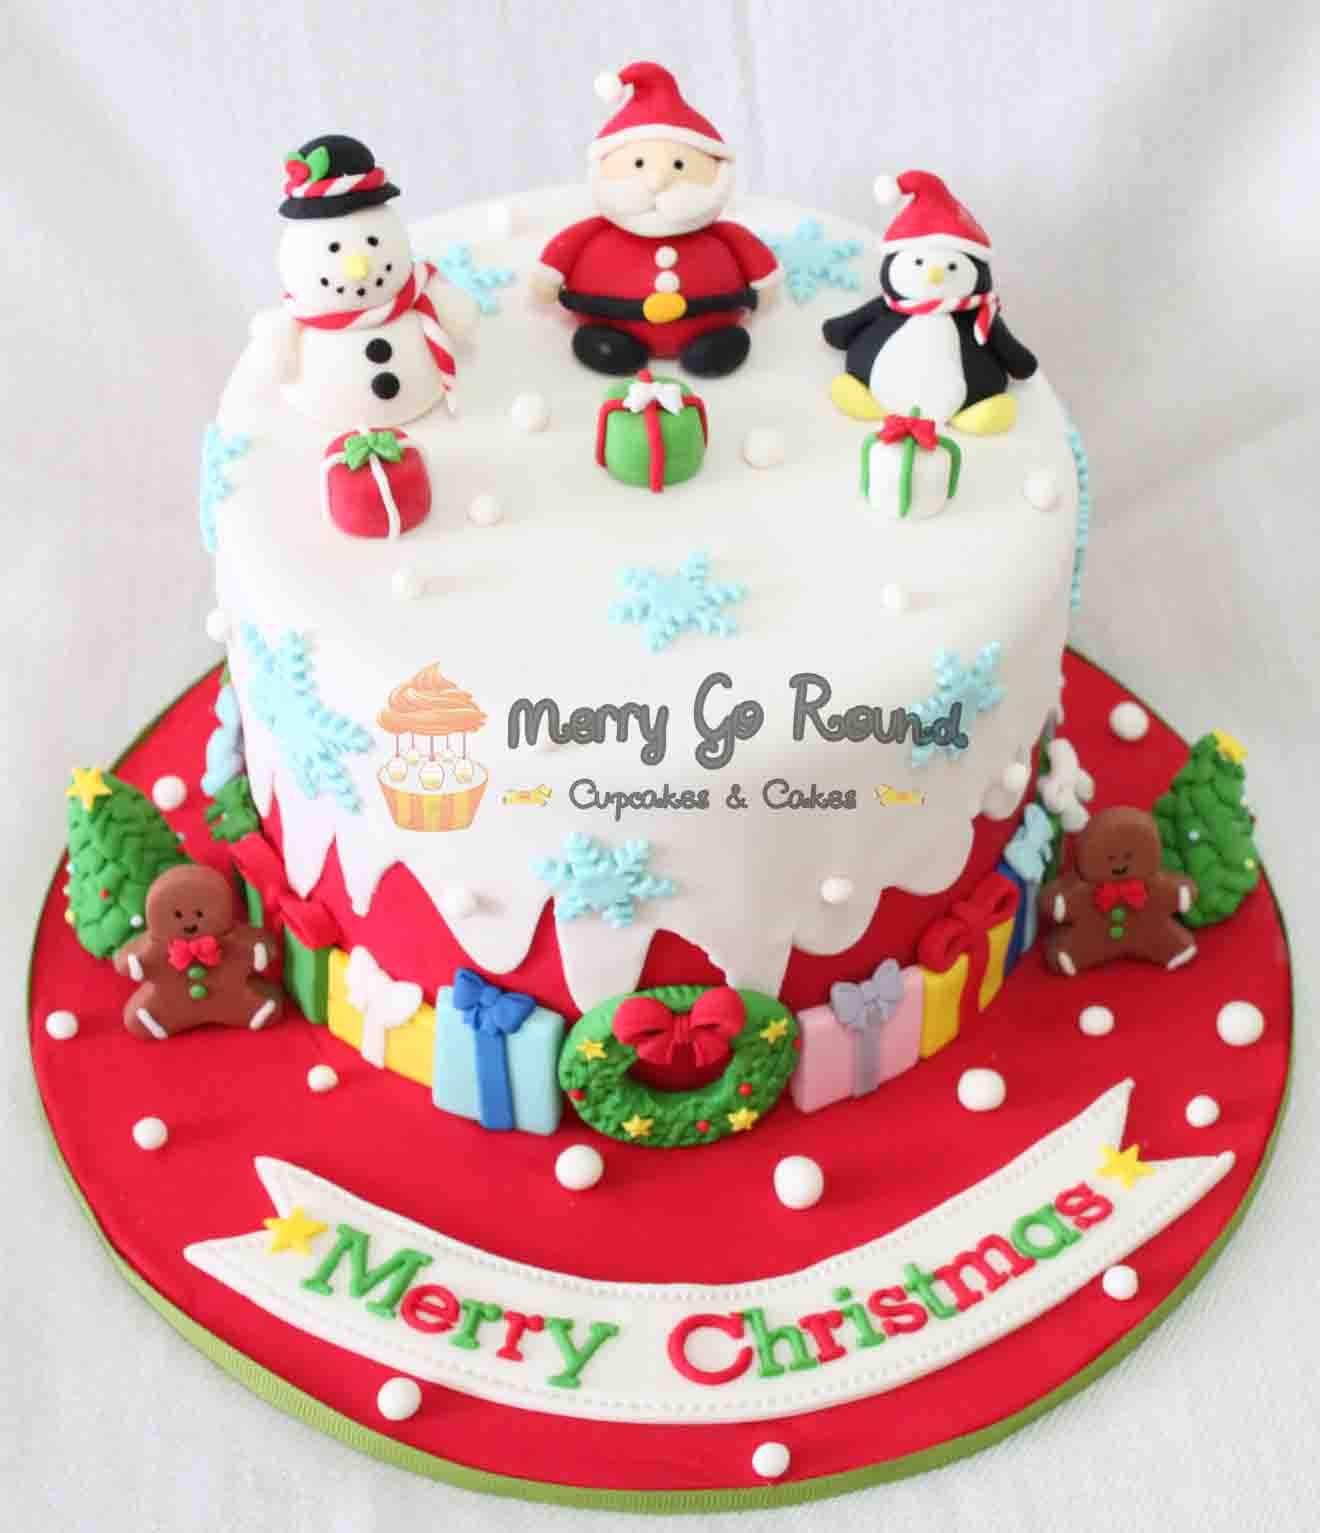 Merry Christmas Cakes  Merry Go Round Cupcakes & Cakes Ho Ho Ho Santa Claus